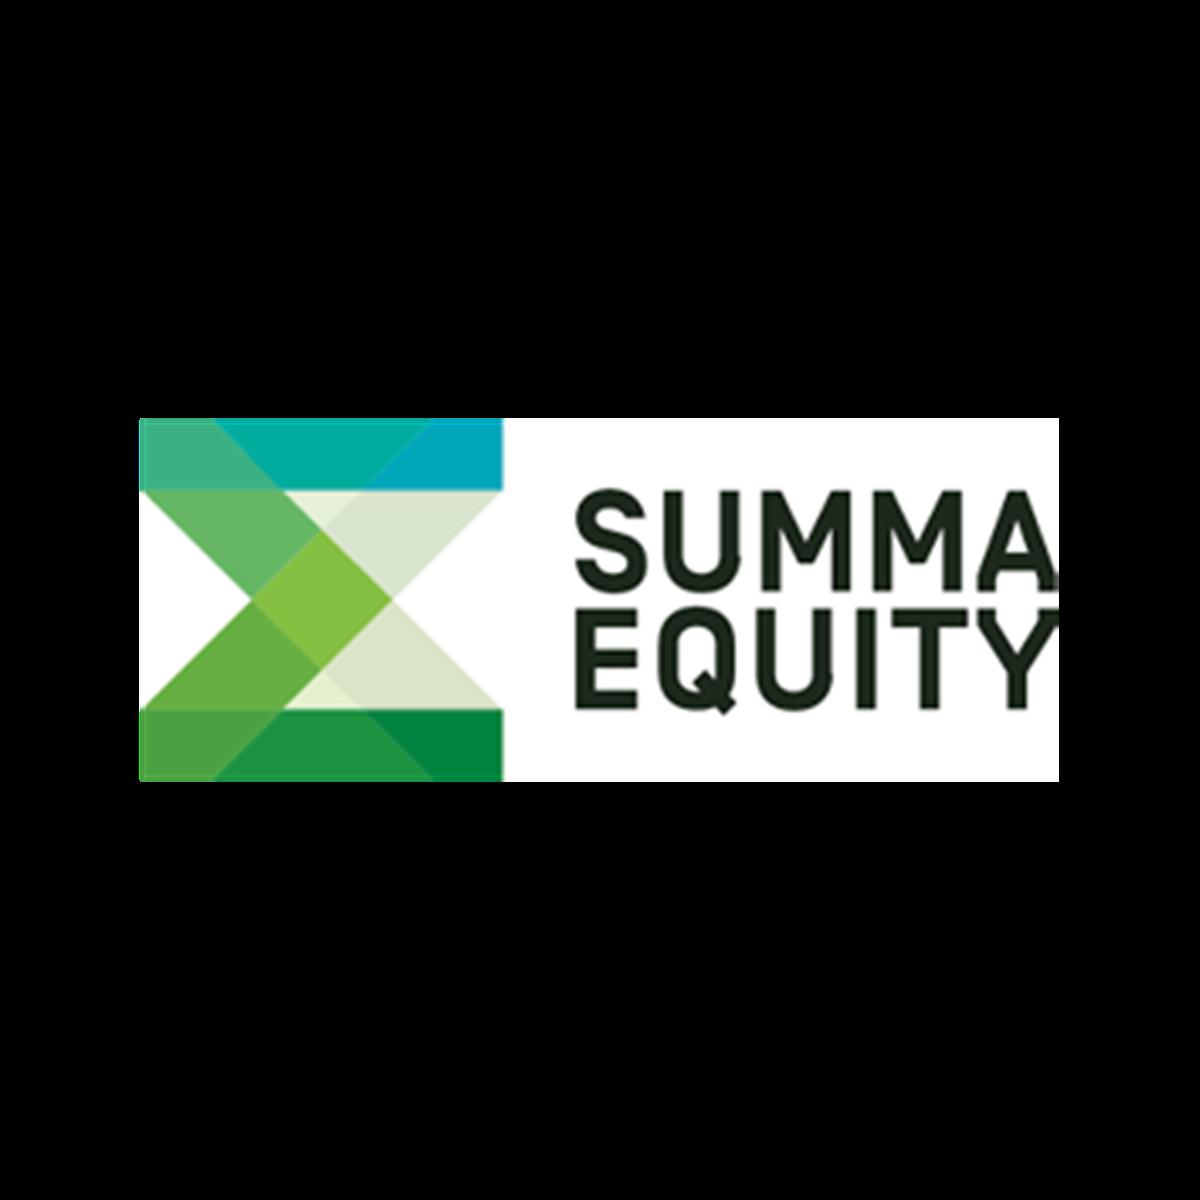 summa-equity-insights-news-large-logo